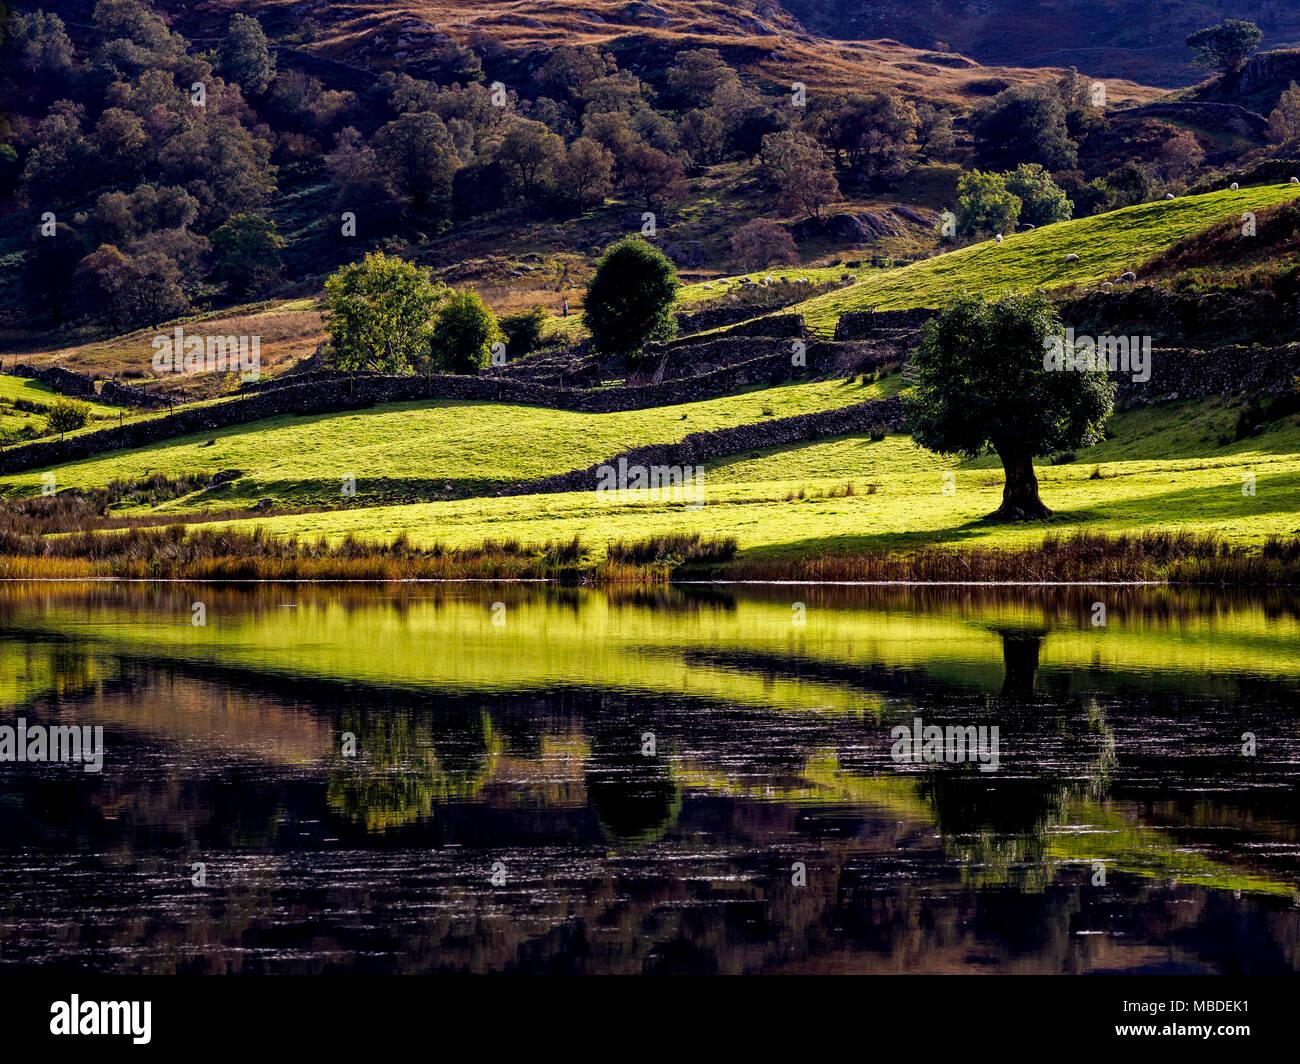 Watendlath Tarn, the Lake District, England. - Stock Image